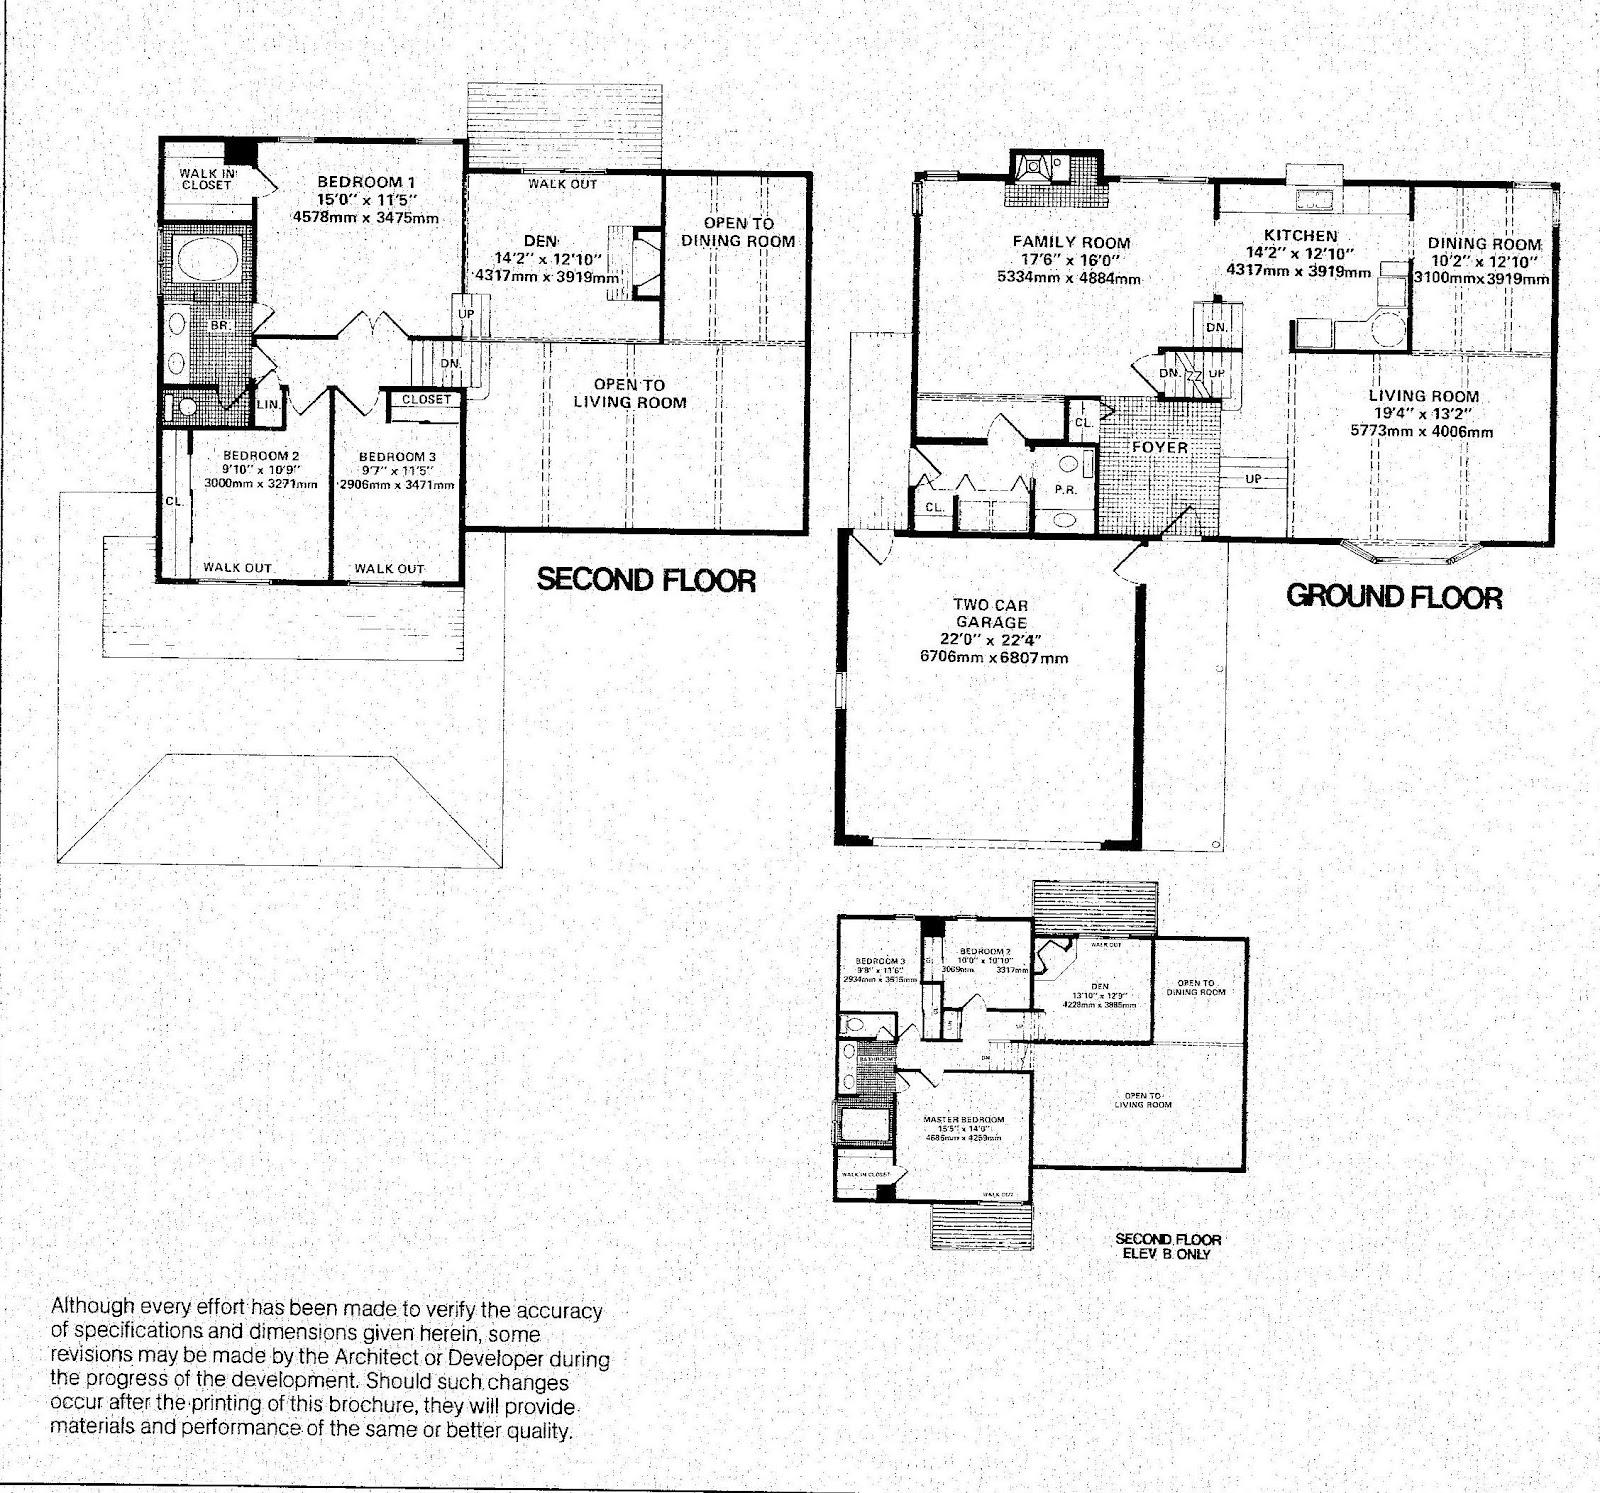 Inform California House Design: Mid-Century Modern And 1970s-Era Ottawa: Favourite Plans